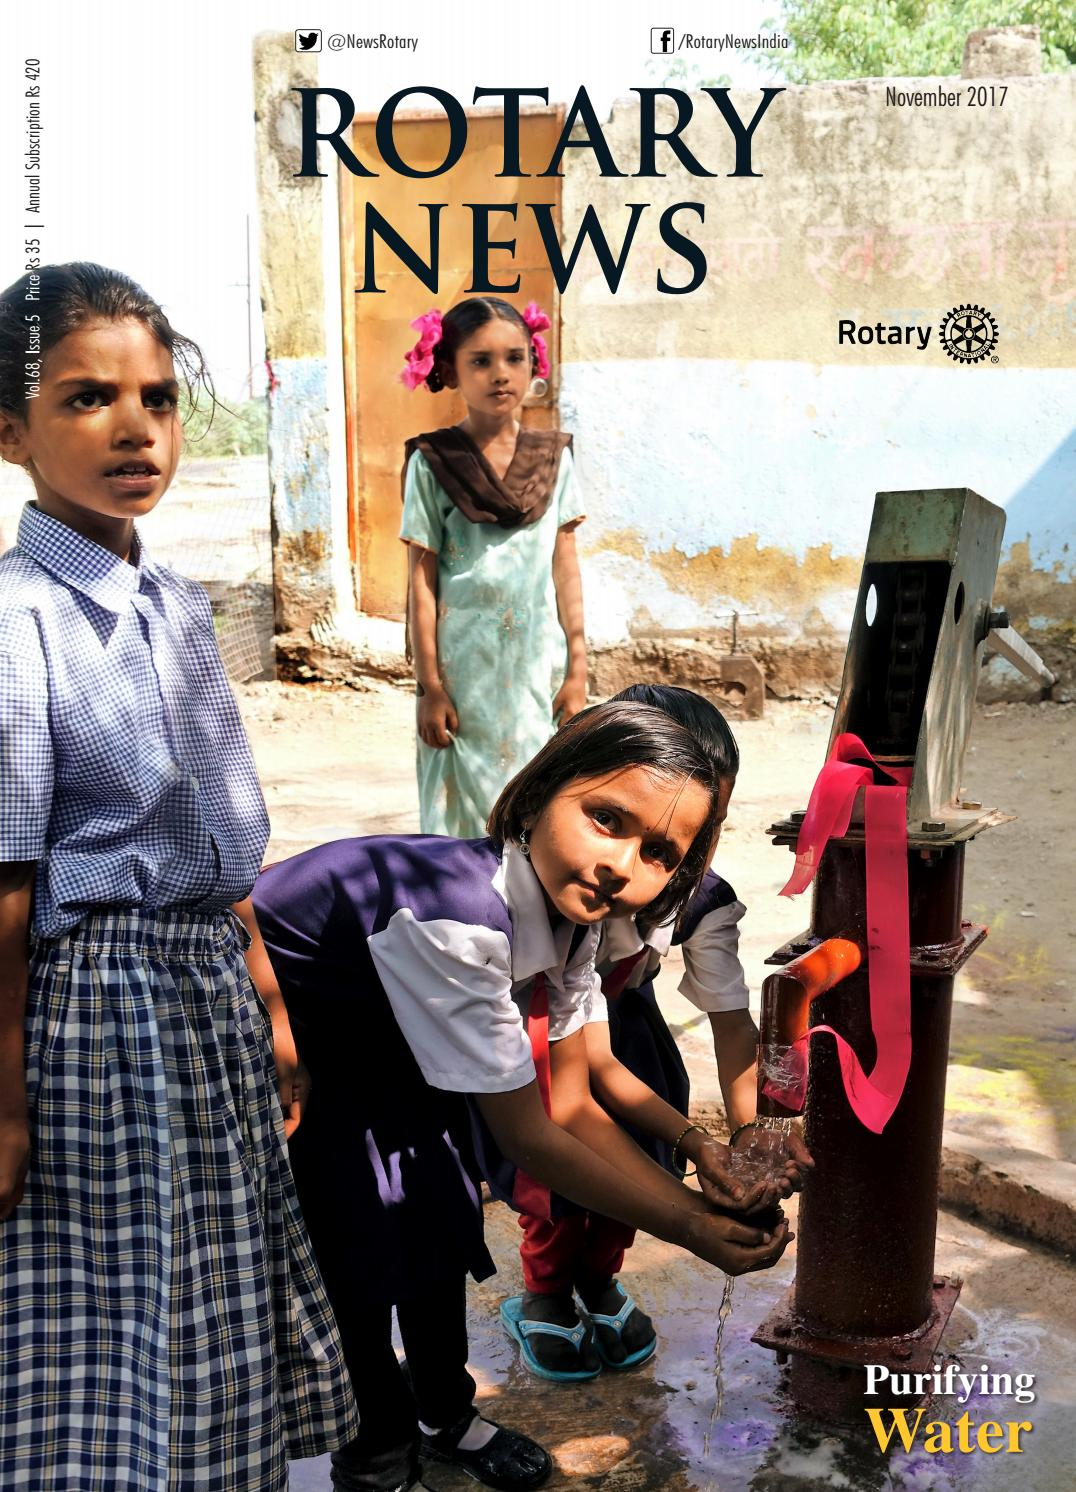 Rotary news november 2017 by Rotary News - issuu